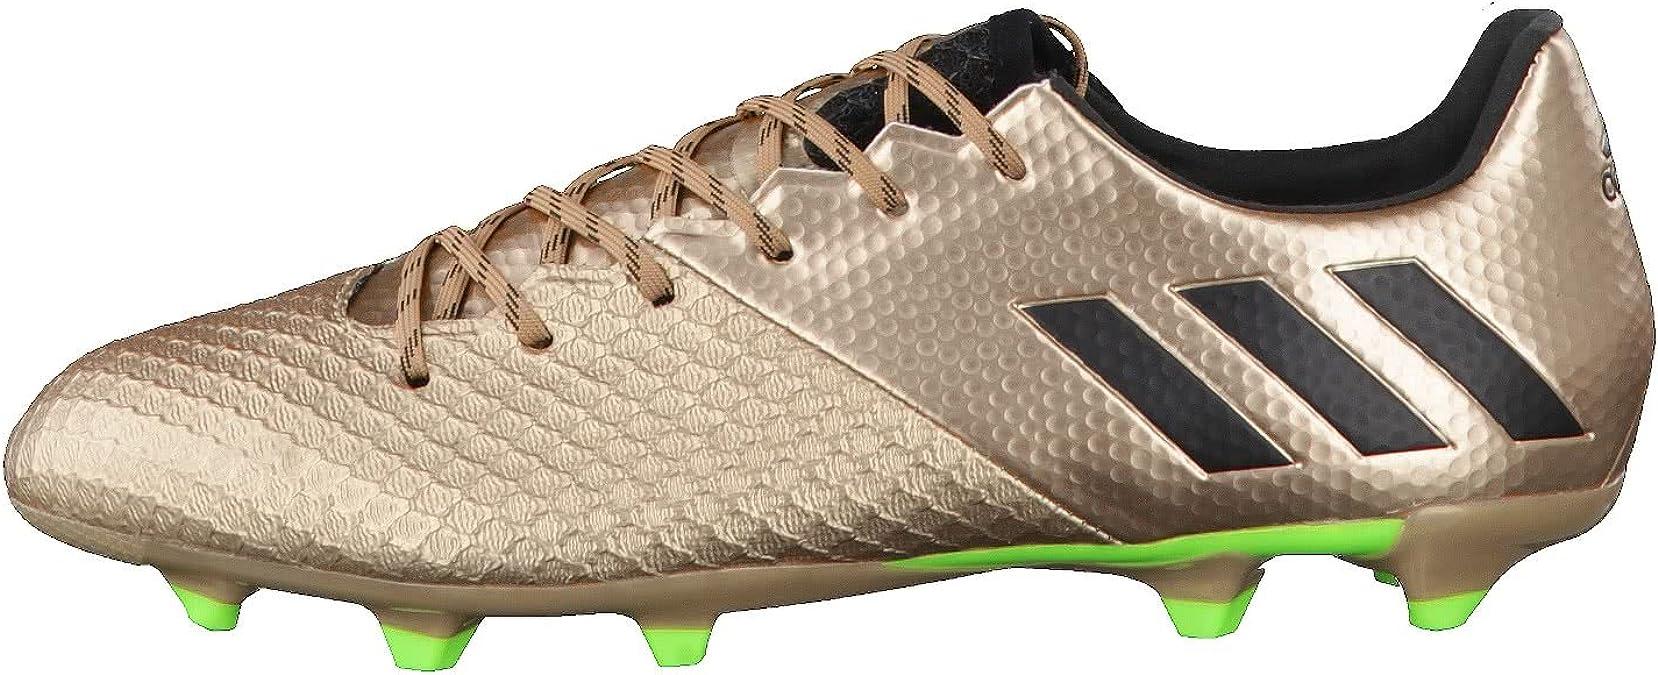 adidas Messi 16.2 FG, Scarpe da Calcio Uomo, Marrone (Bronzo